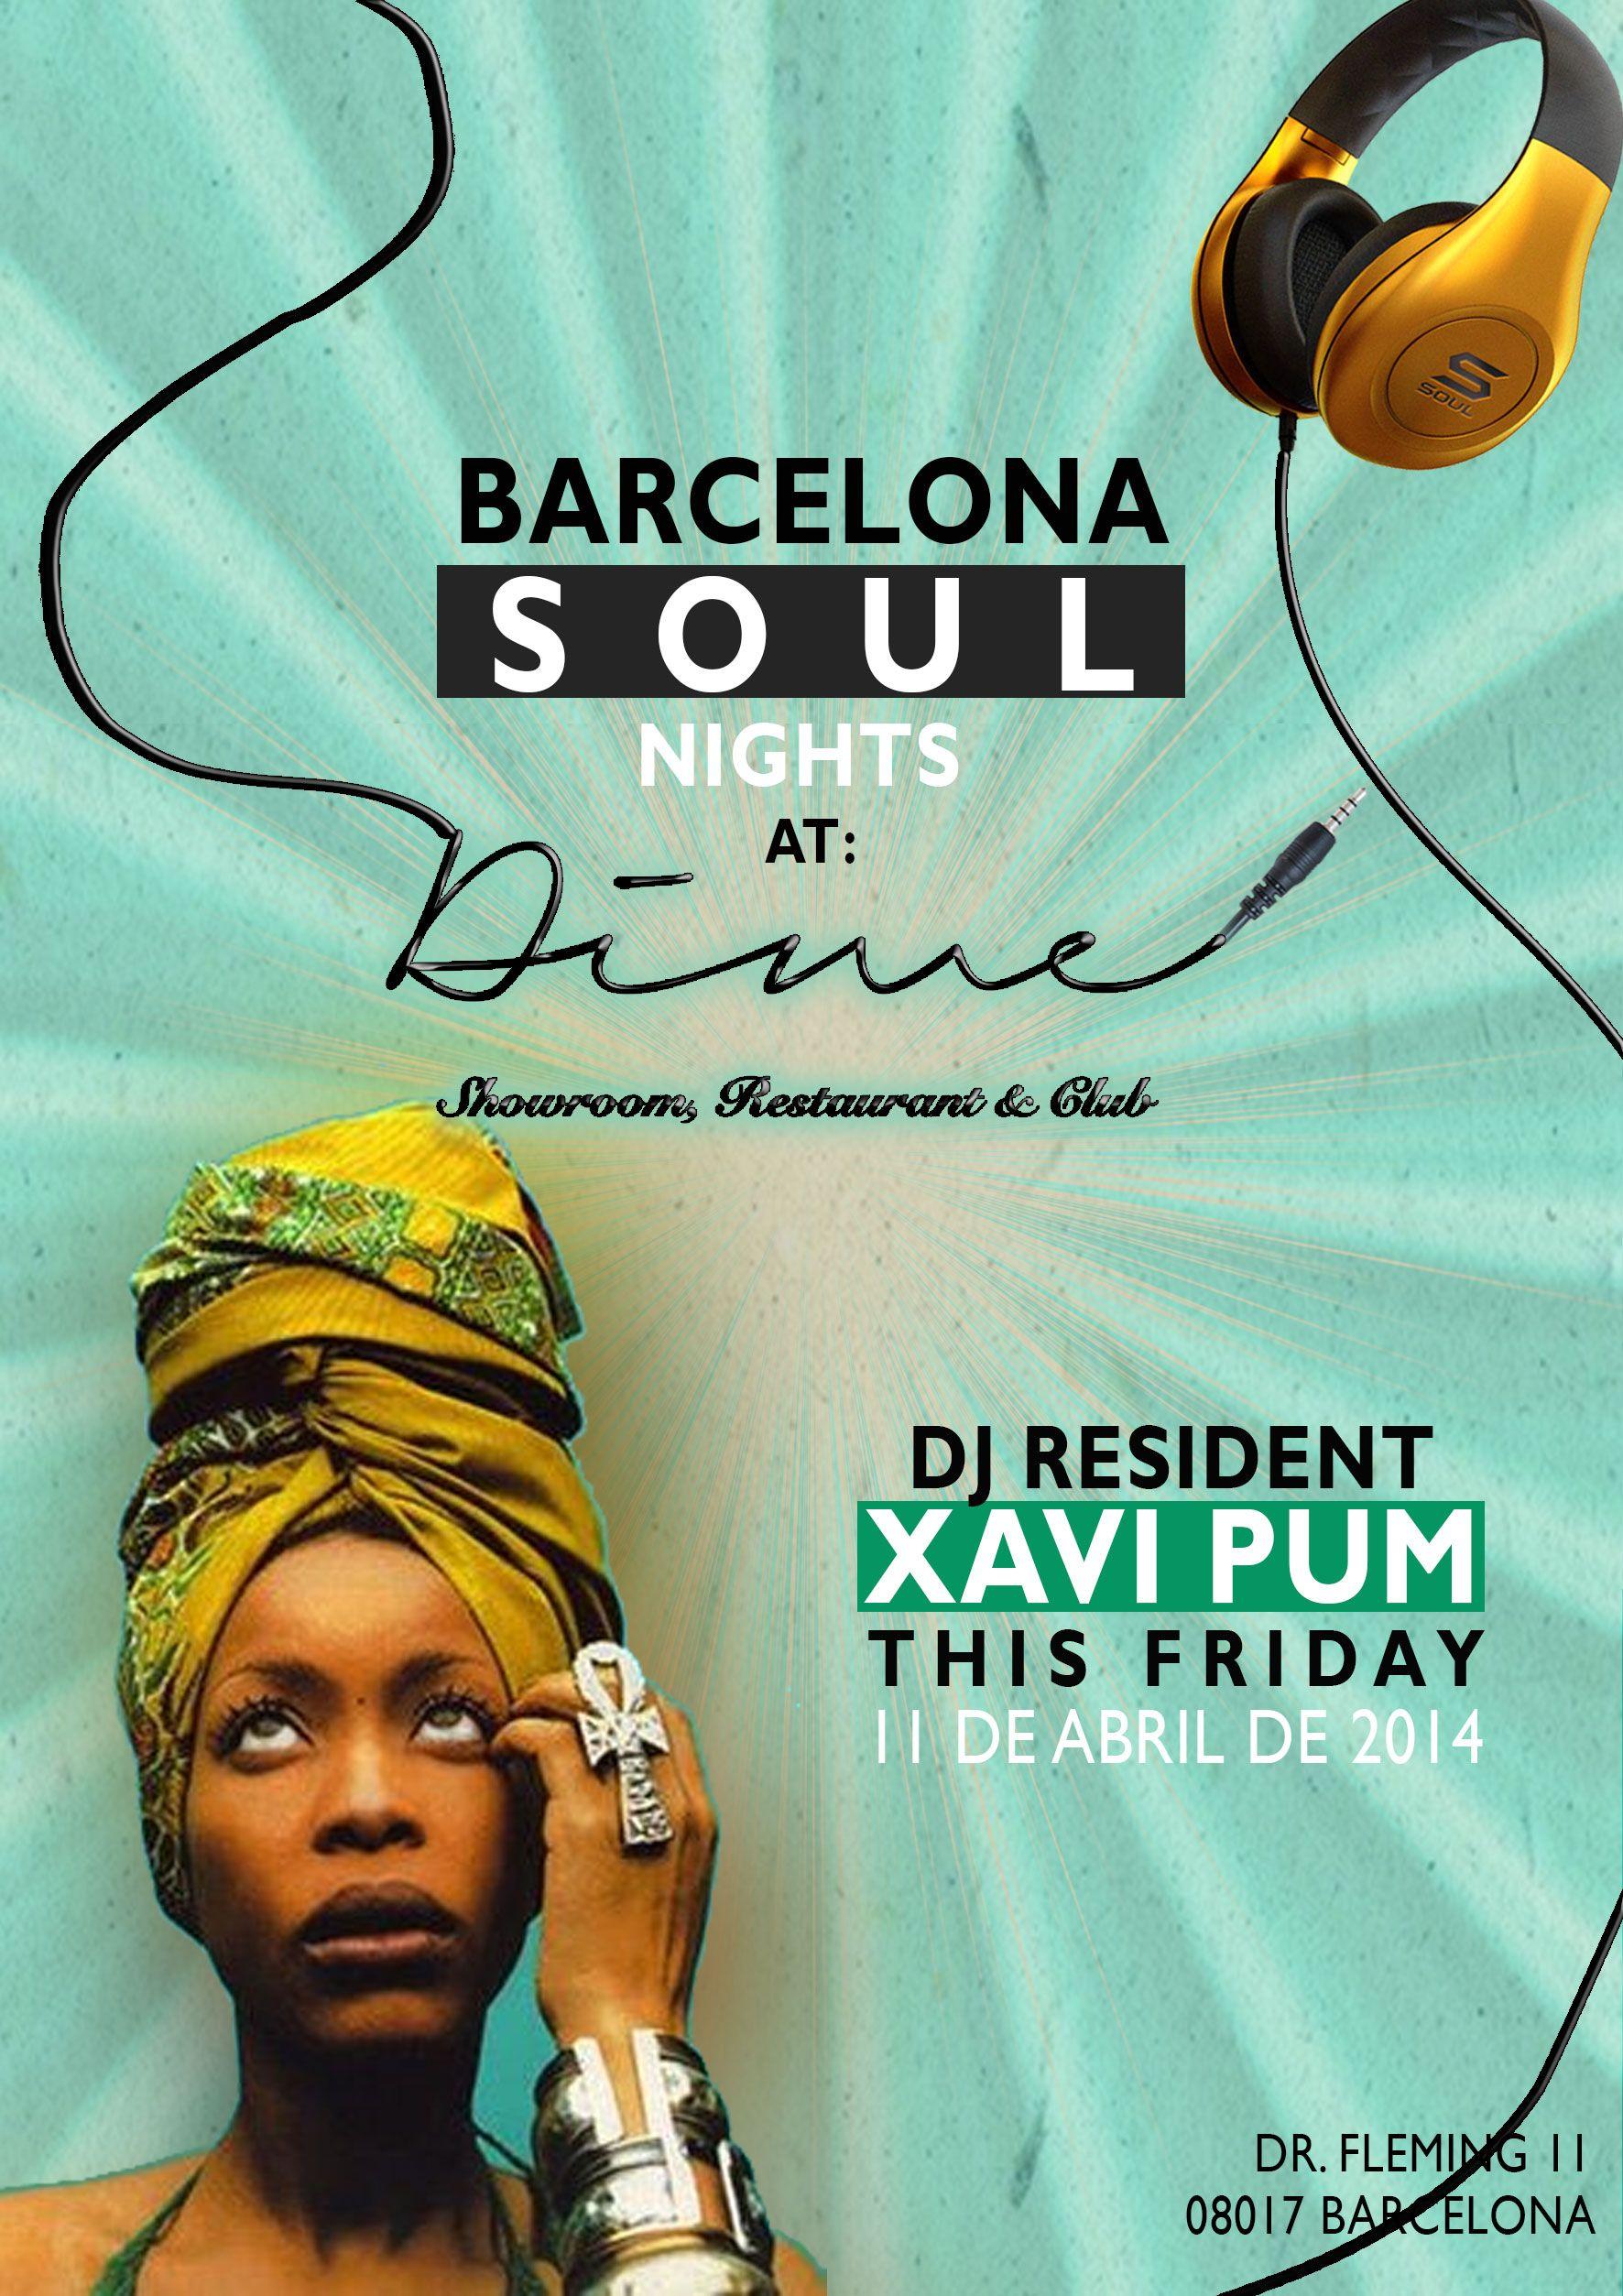 SOUL NIGHT! Stomp Your Feet and Groove to the Beat w/ our DJ Resident Xavi Pum!  #soulnight #fridaynight #barcelonaparty #estanoche #dimebarcelonaclub #viernesnoche #fiestabarcelona #dimeclubxavipum — en Dime Restaurant & Club Barcelona. www.dimebarcelonarestaurant.com